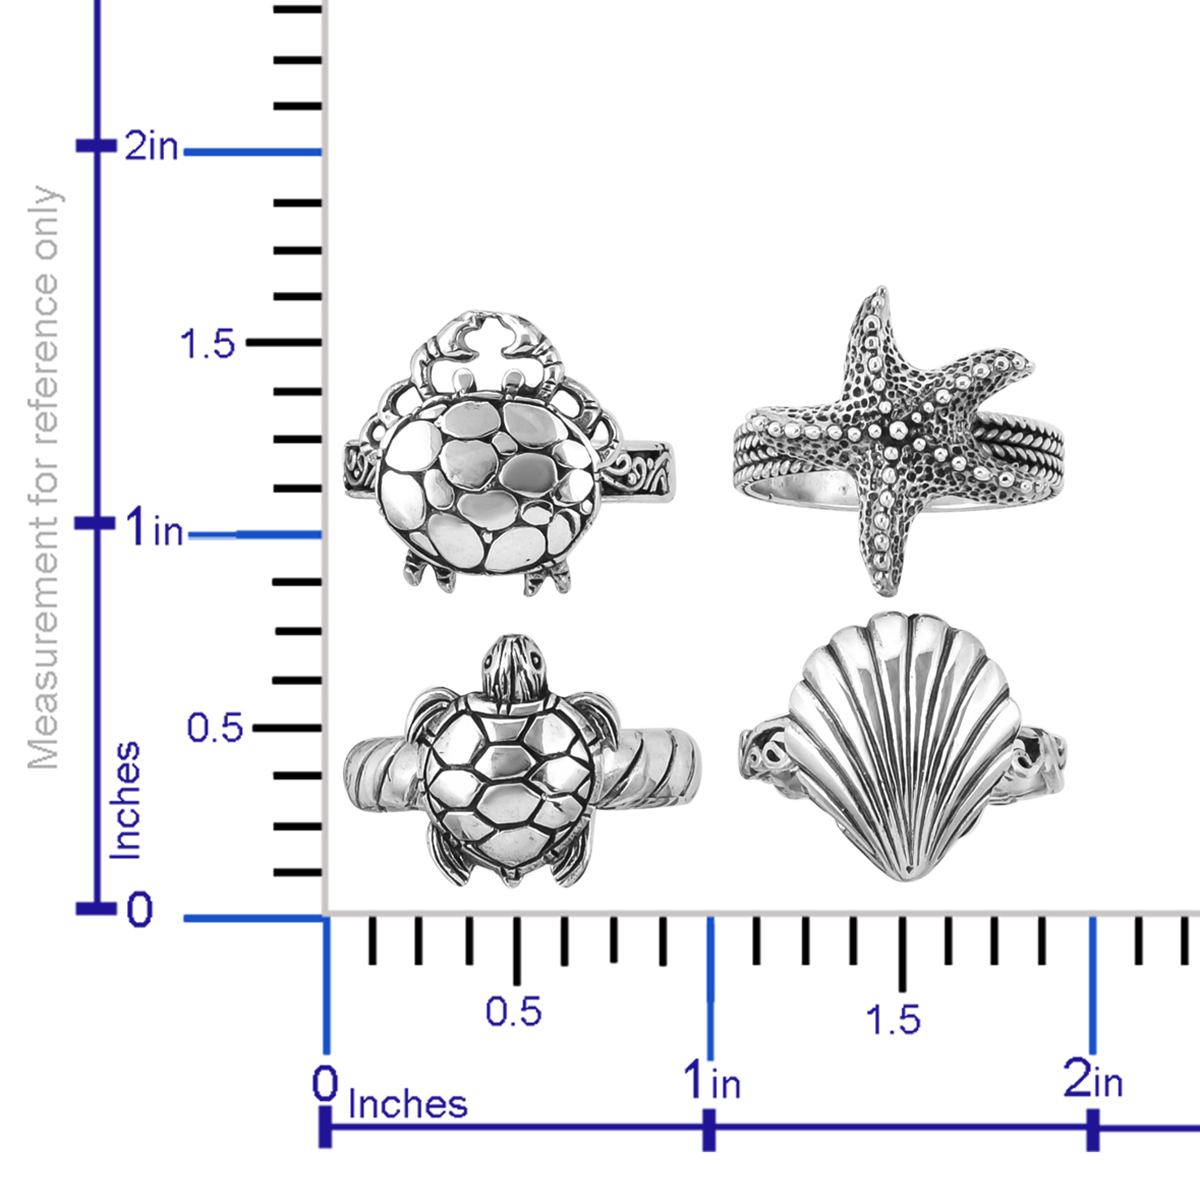 BALI LEGACY Ocean Life Set of 4 Rings in Sterling Silver (Size 6.0) (Avg. 12 g)